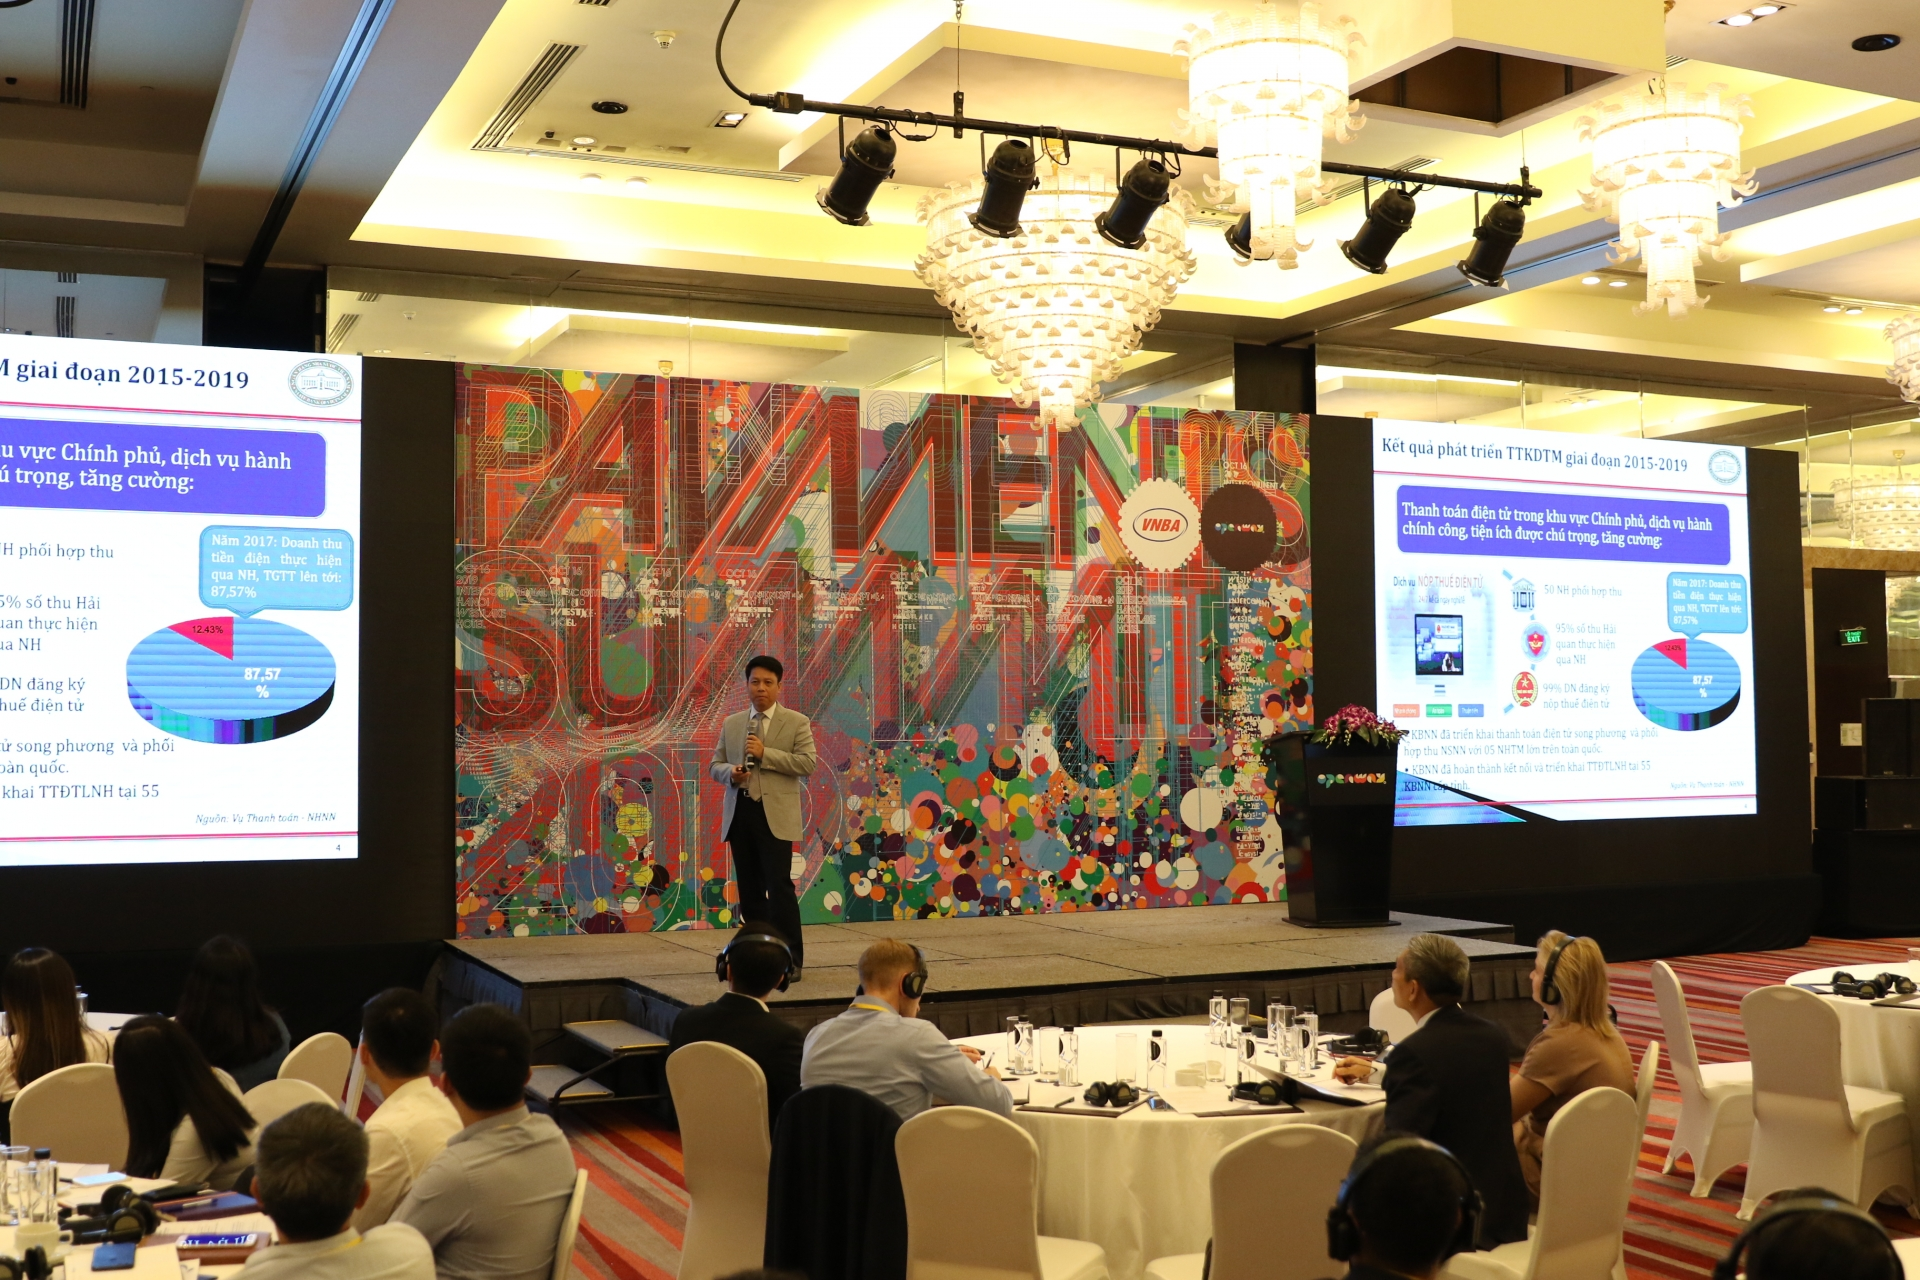 Building a digital ecosystem for non-cash payment